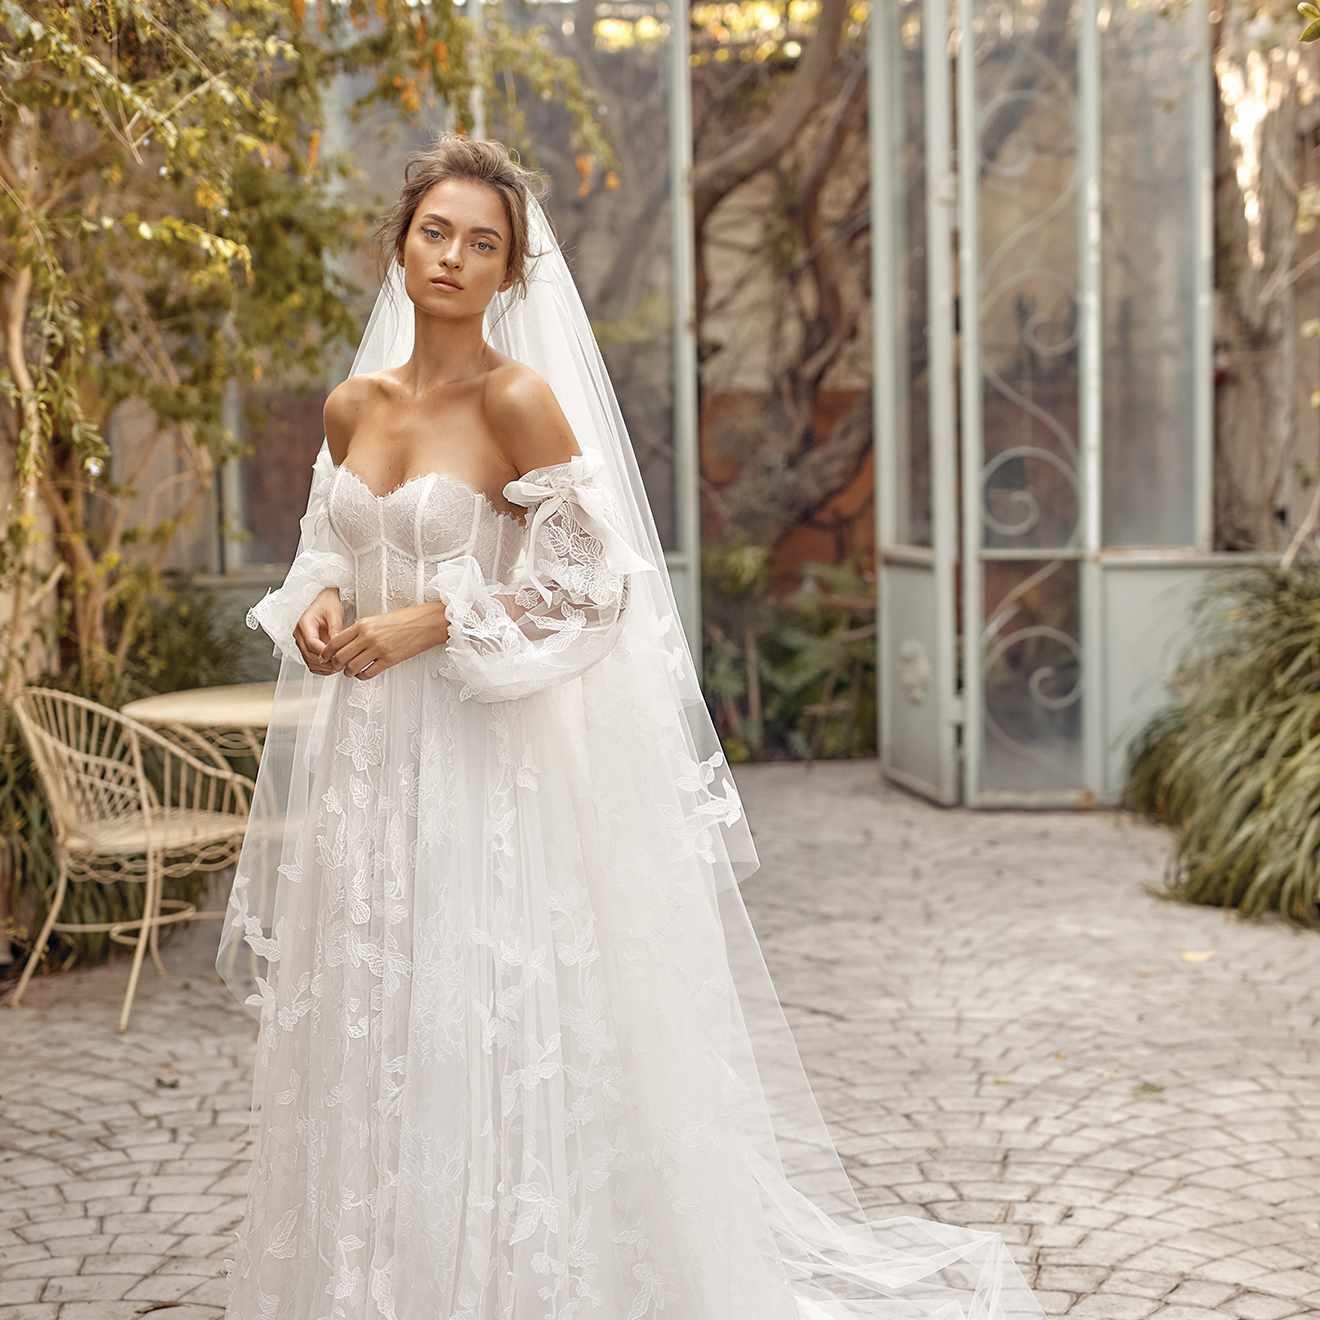 Sunny wedding dress